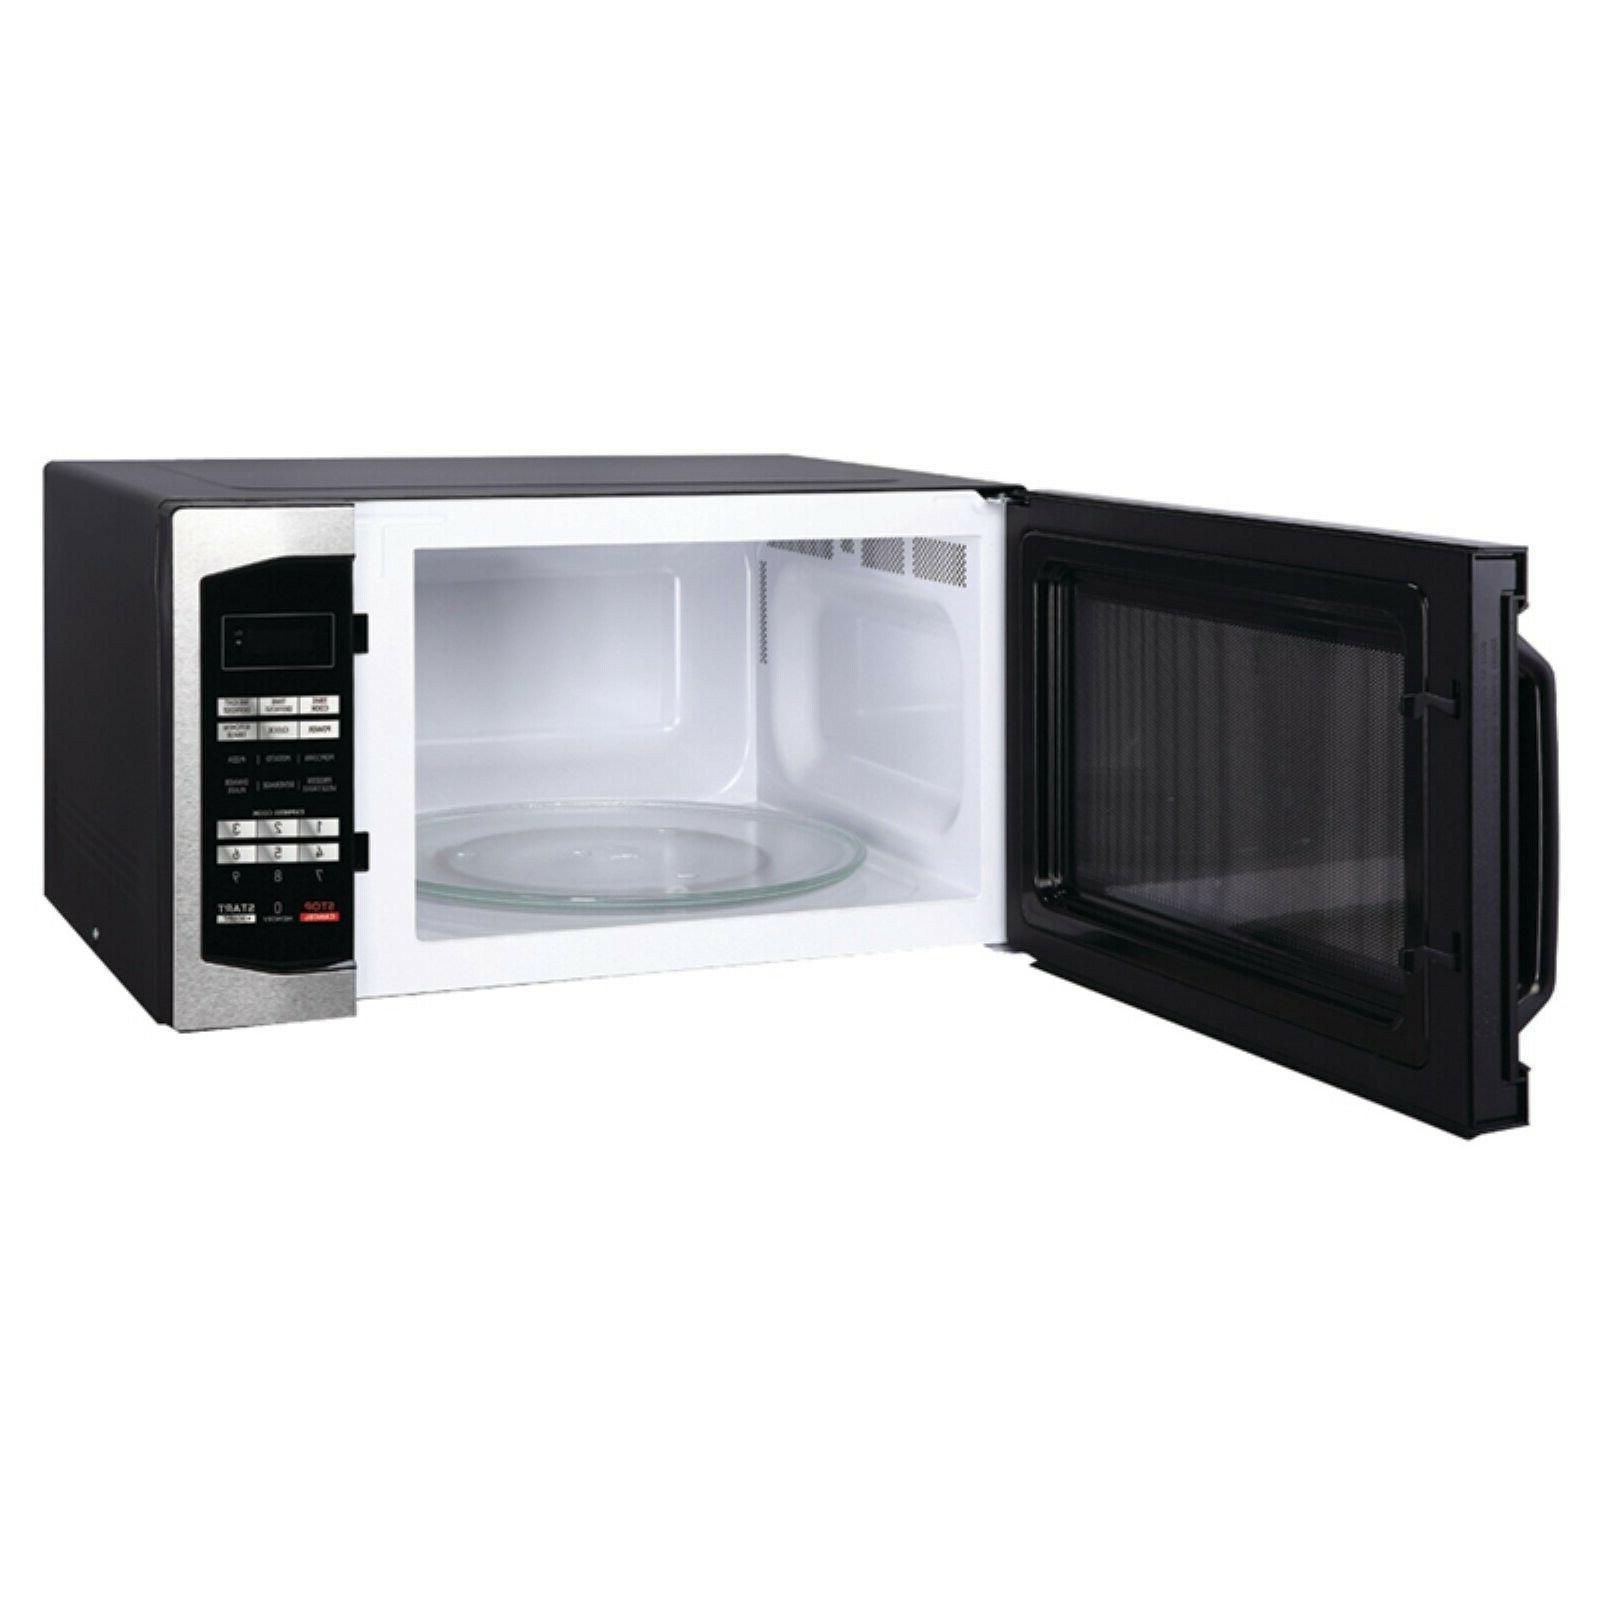 1 6 cu ft 1100w countertop microwave